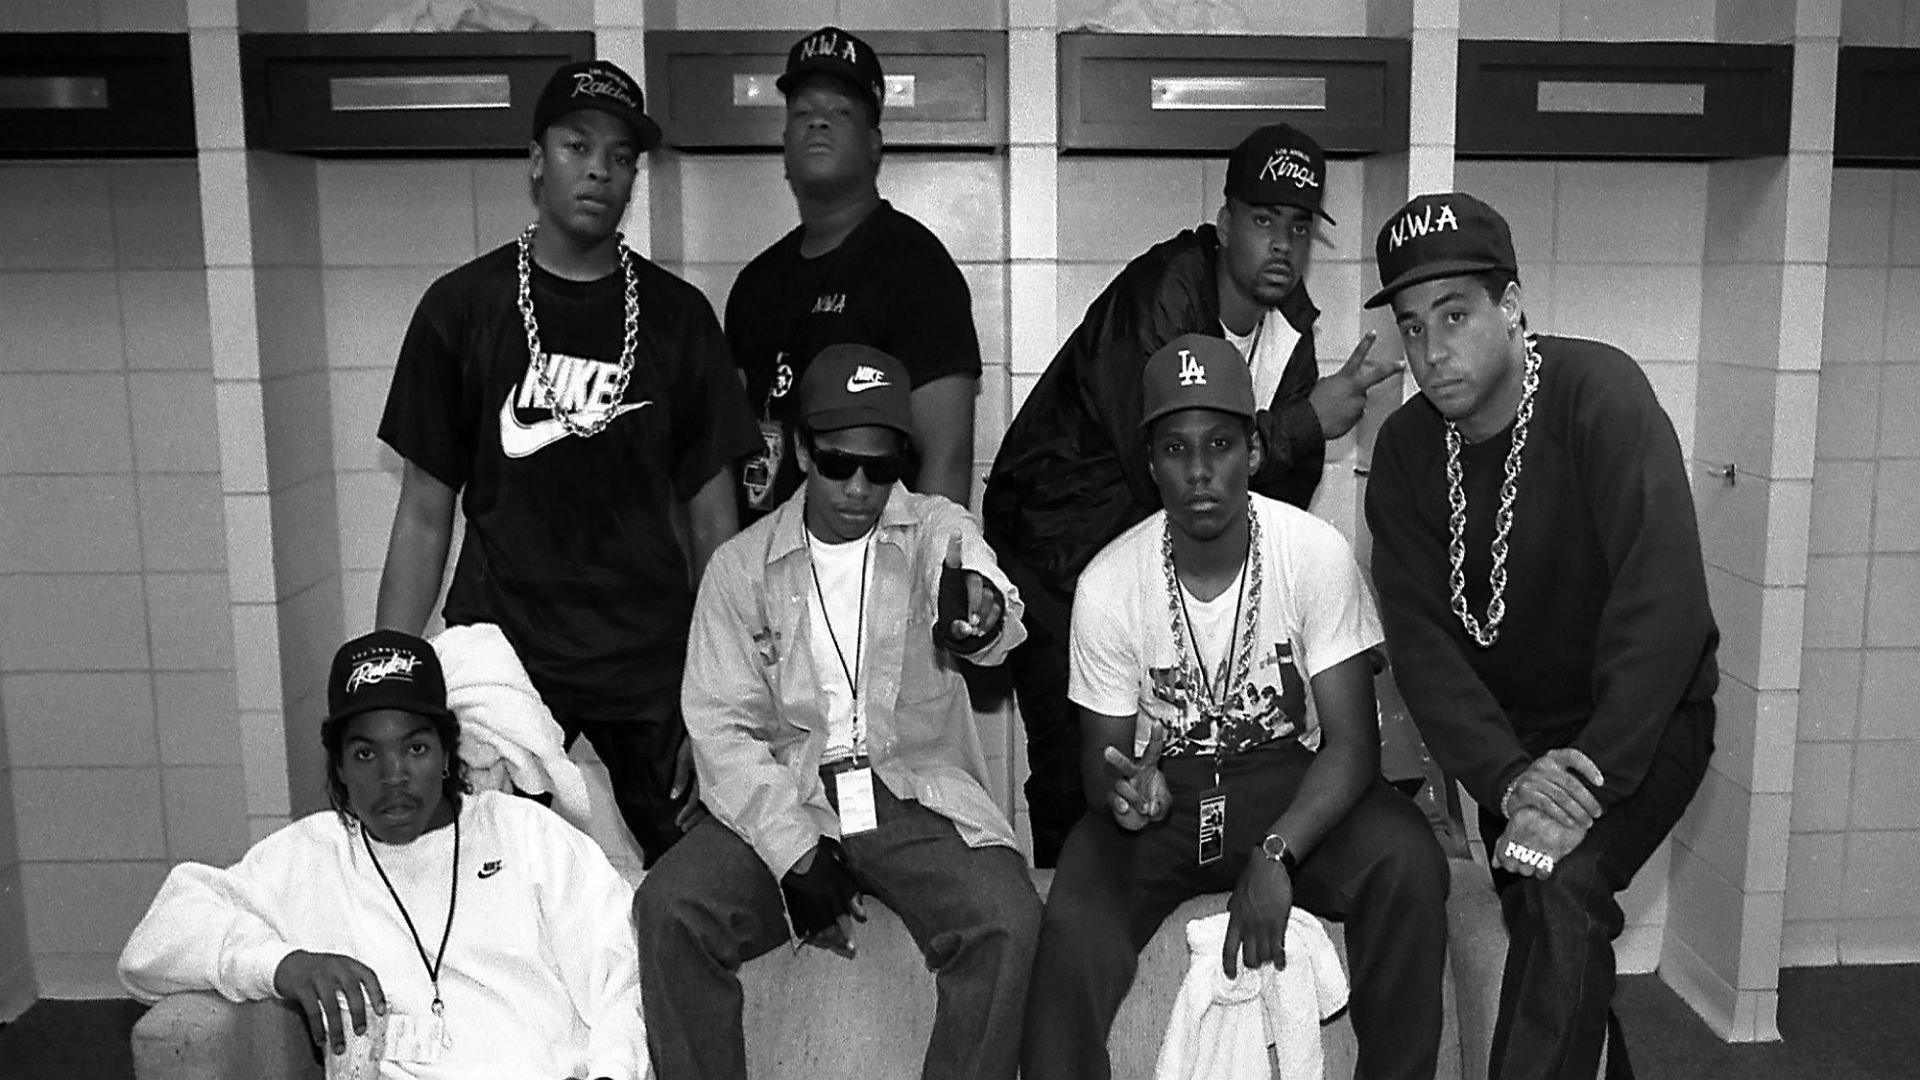 STRAIGHT OUTTA COMPTON rap rapper hip hop gangsta nwa 1920x1080